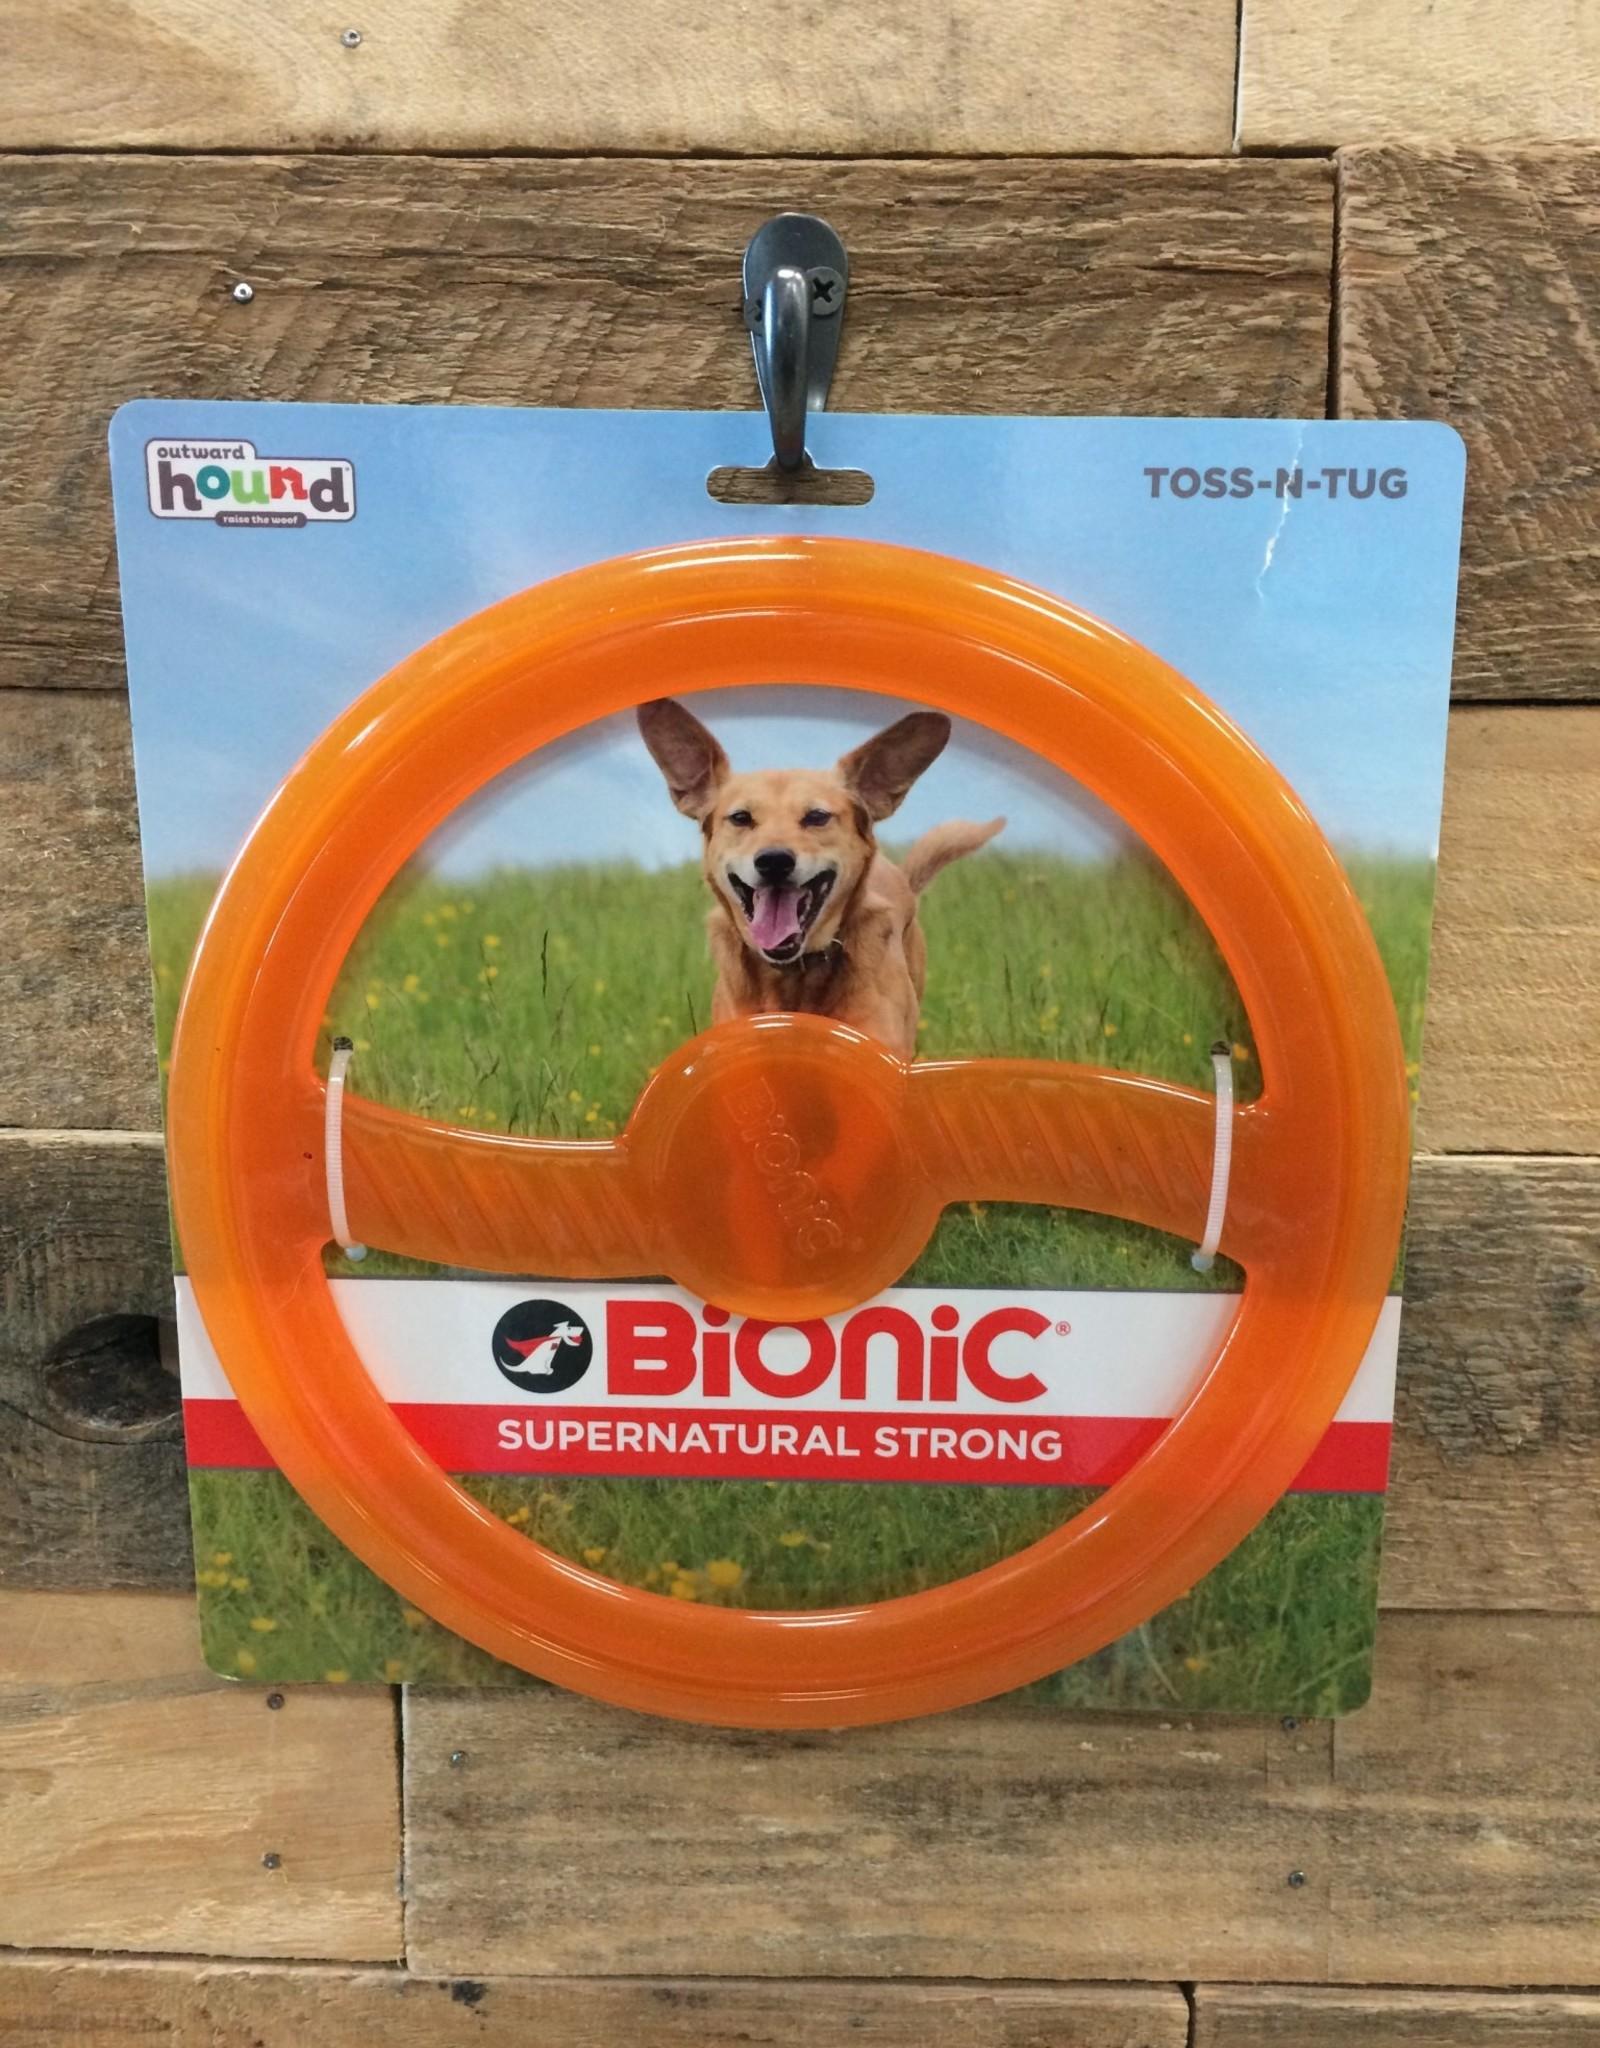 Outward Hound - Bionic Bionic Toss and tug orange